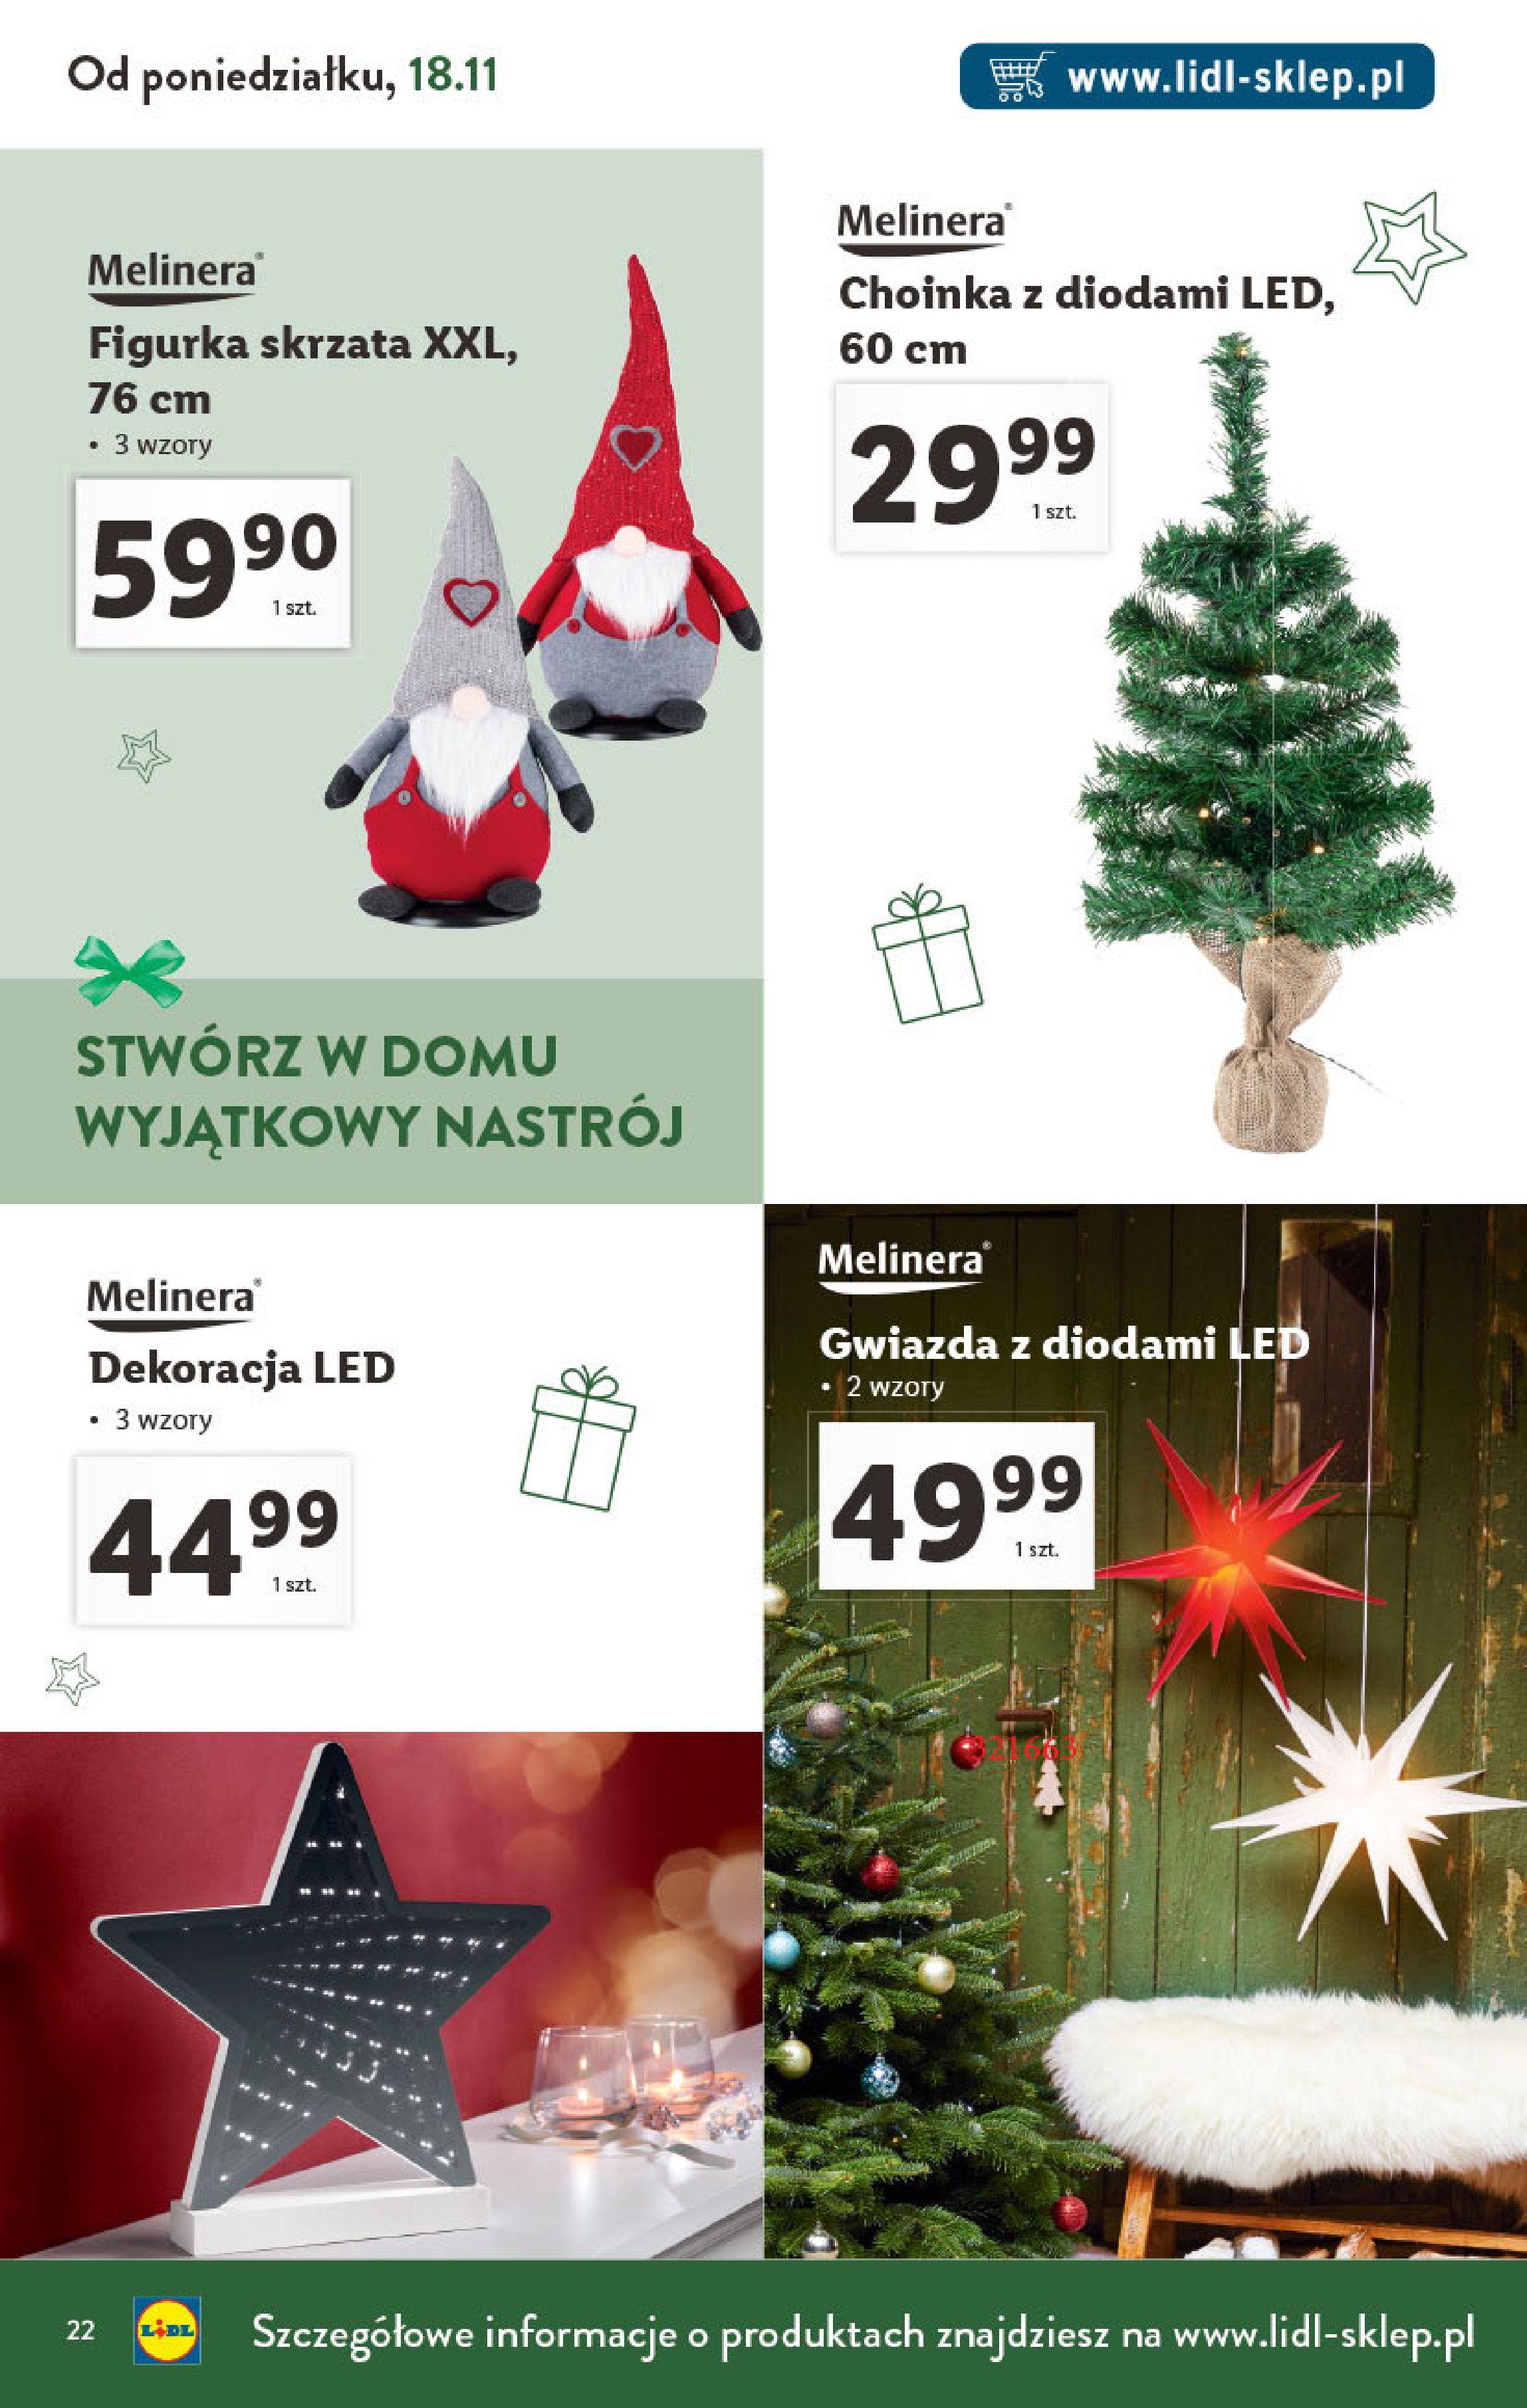 Gazetka Lidl - Katalog Online-13.10.2019-02.12.2019-page-22